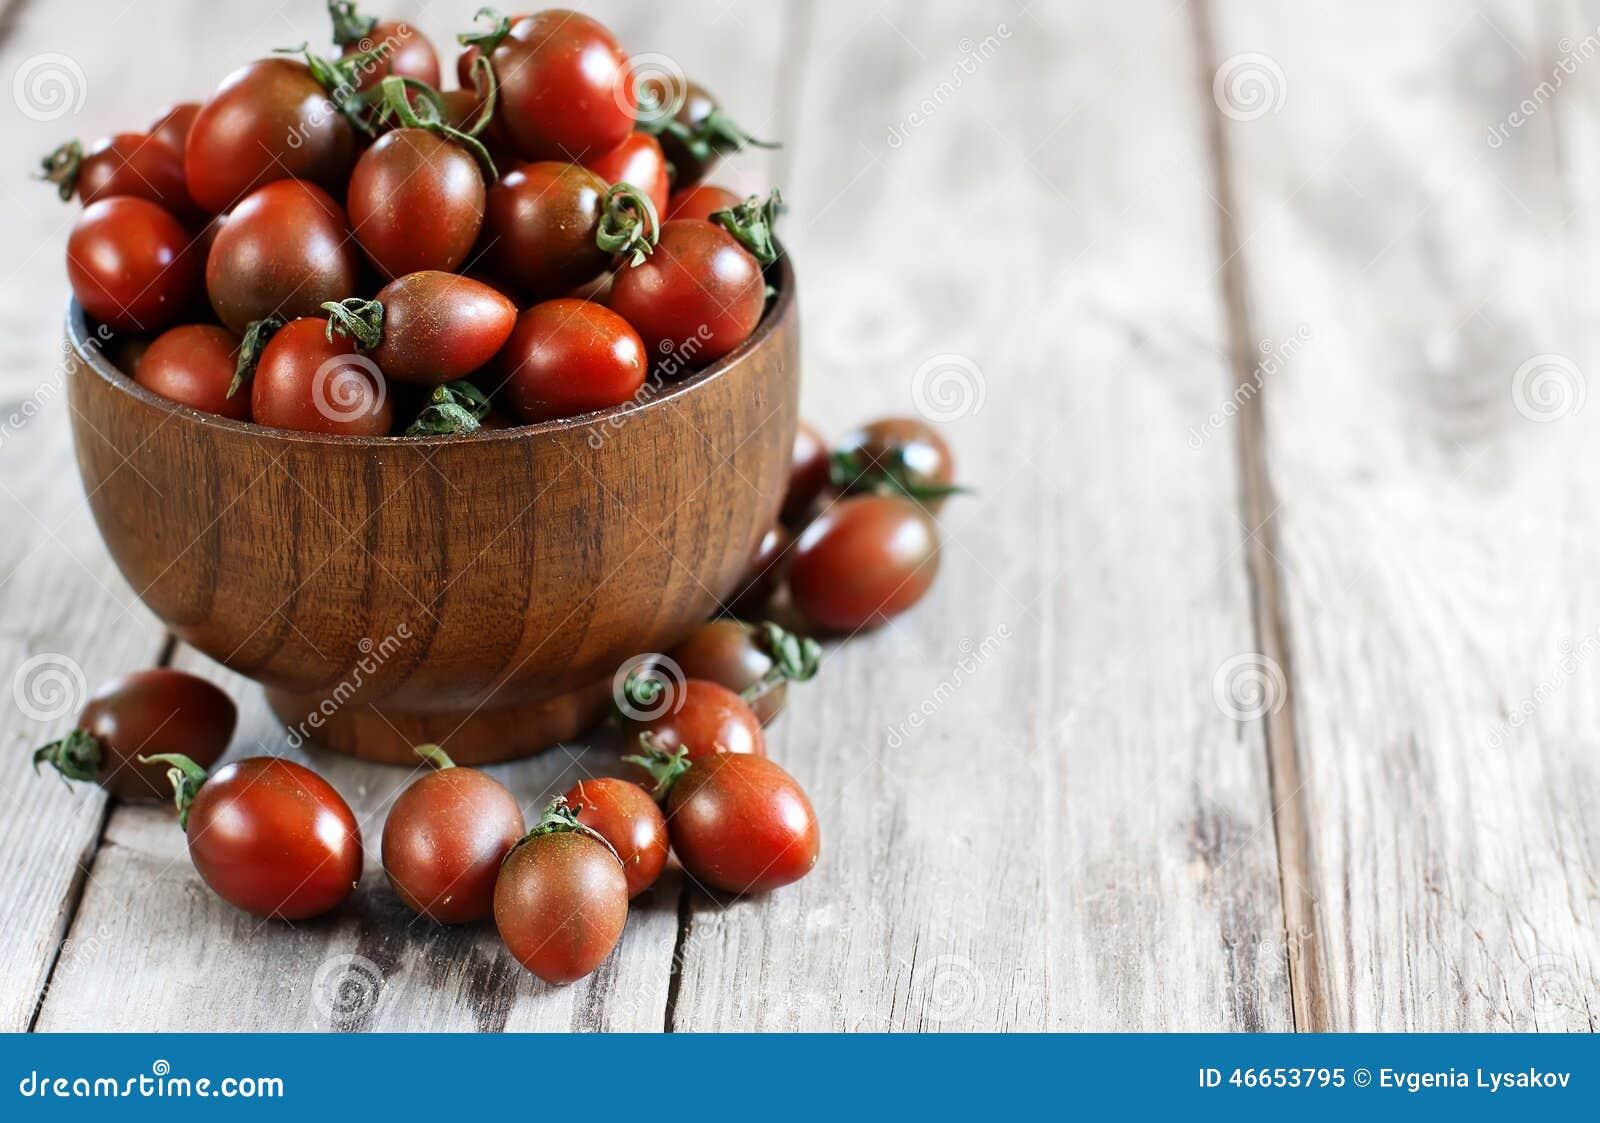 Black Cherry Tomato Background Stock Photo - Image: 46653795